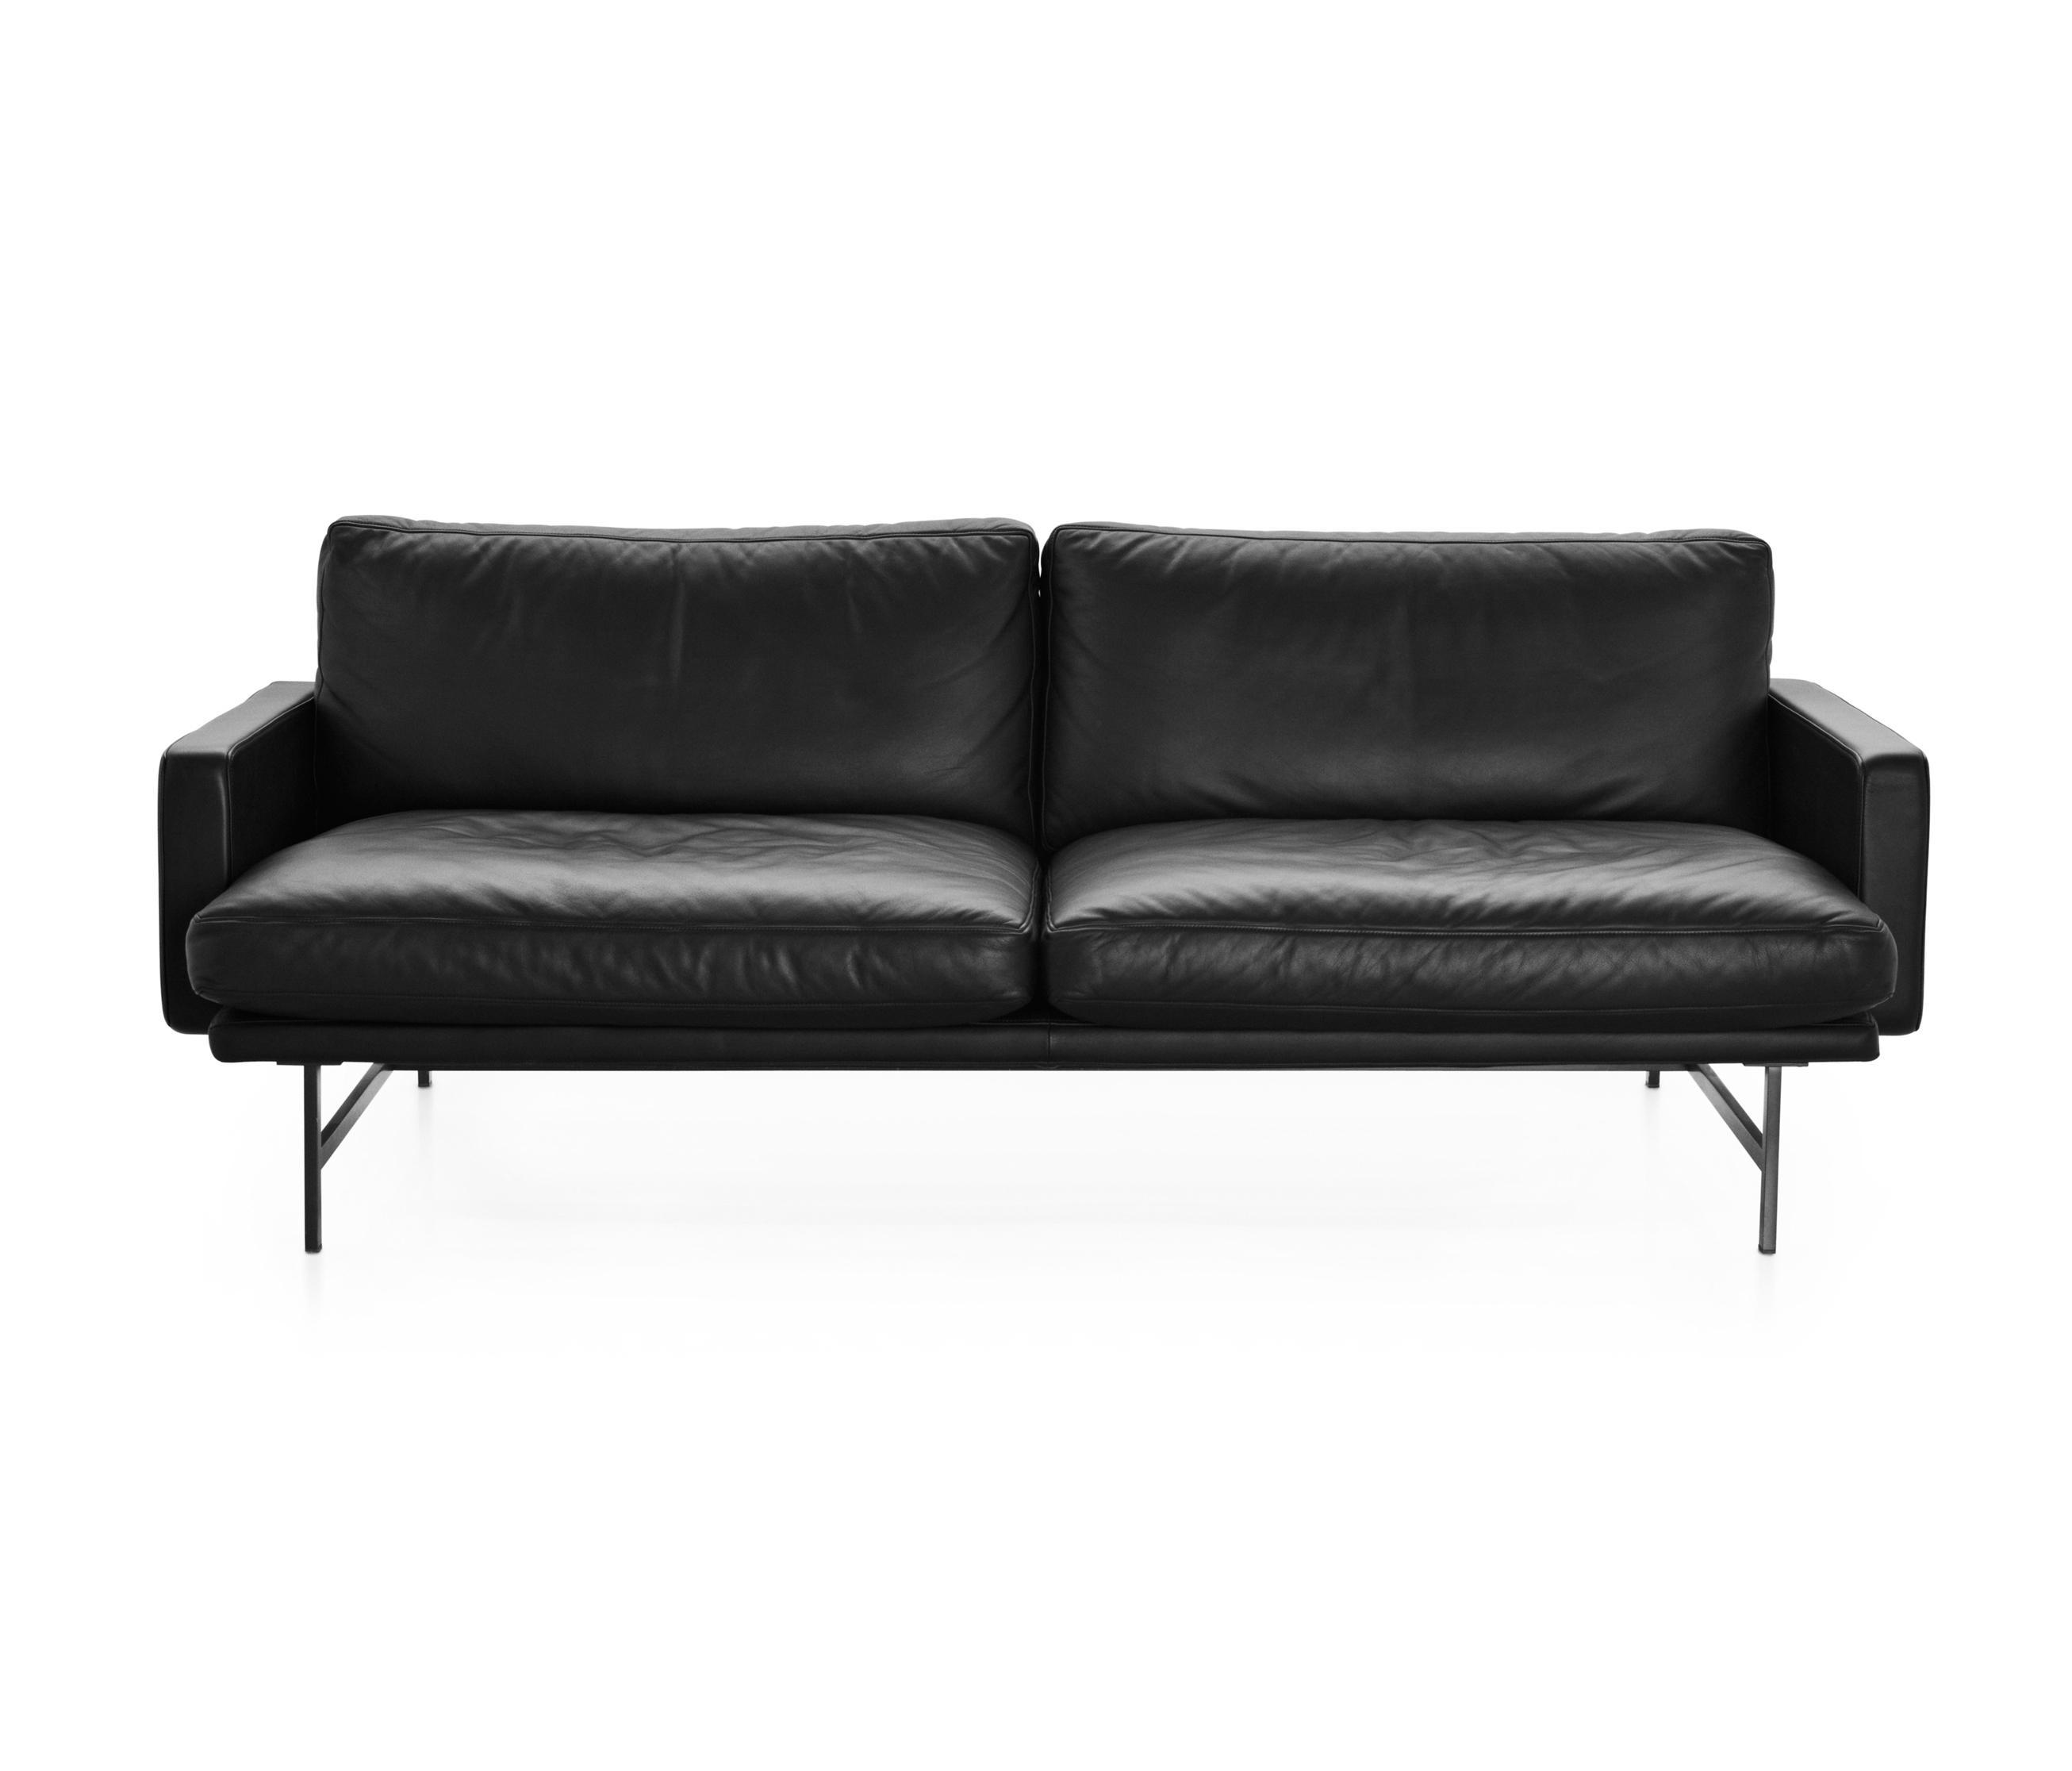 lissoni sofa pl112 loungesofas von fritz hansen architonic. Black Bedroom Furniture Sets. Home Design Ideas